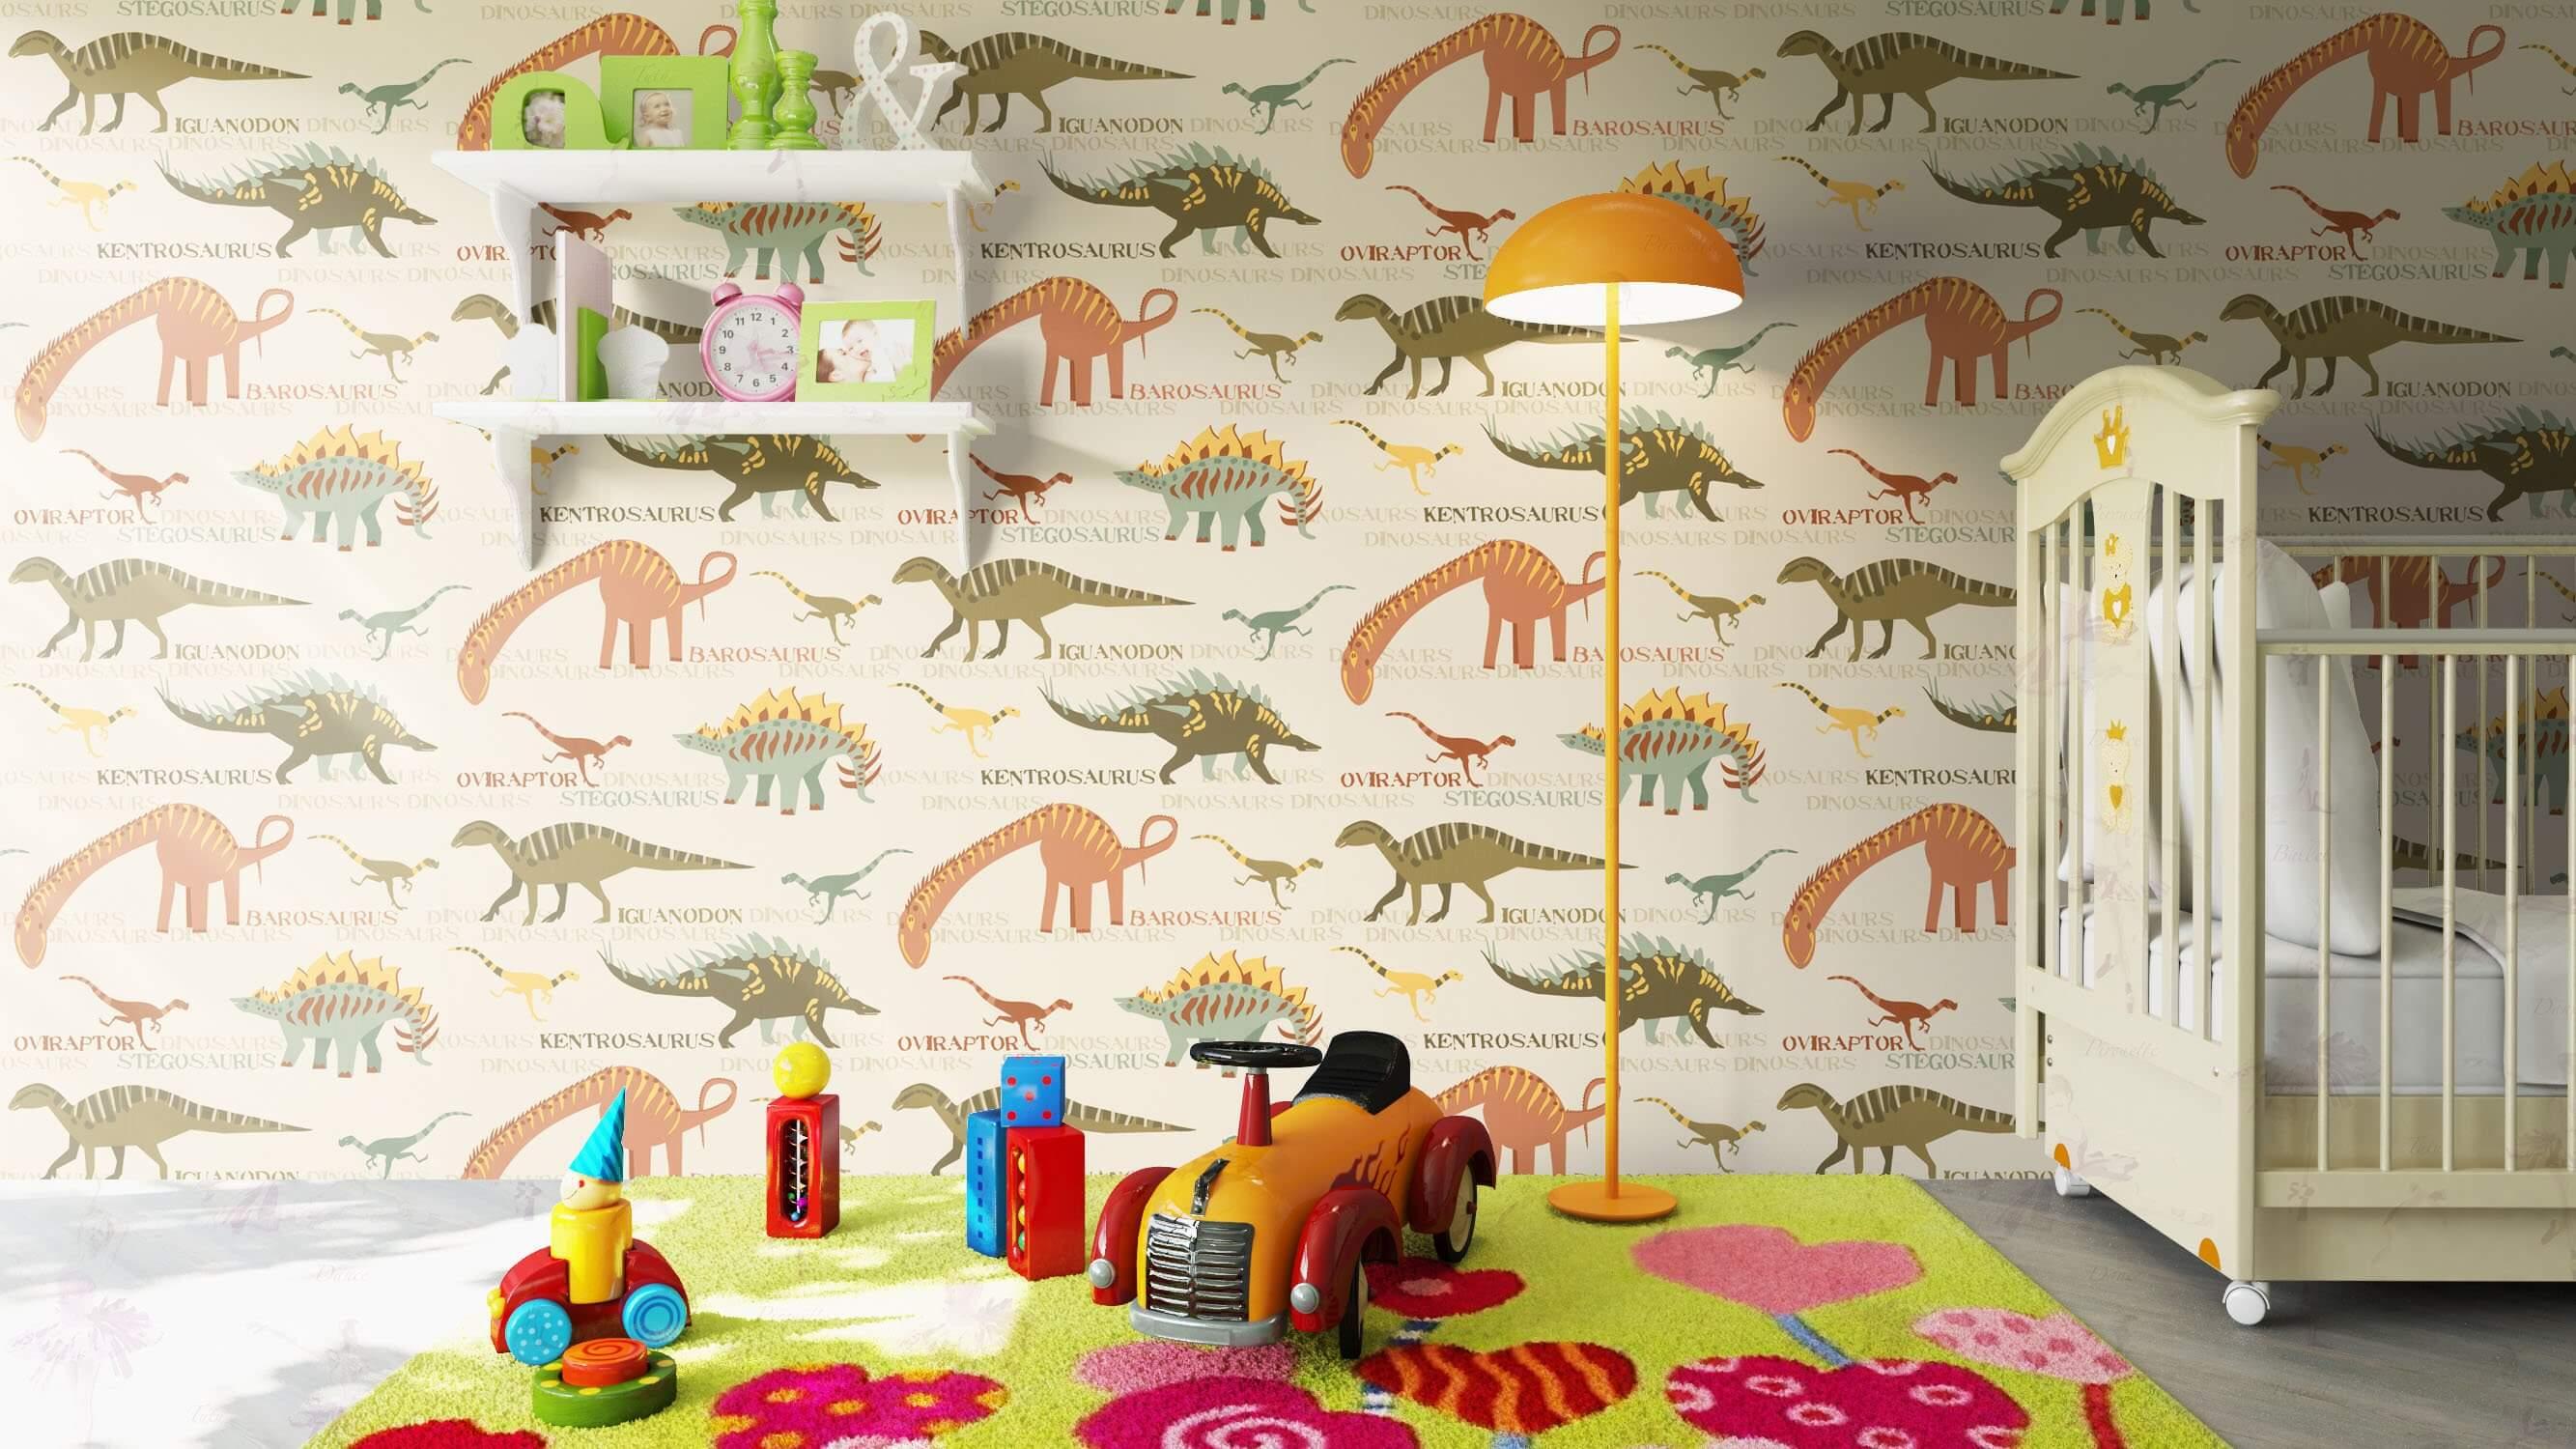 Tapete Kinder Kinderzimmer Dinos Deko Dino Dino